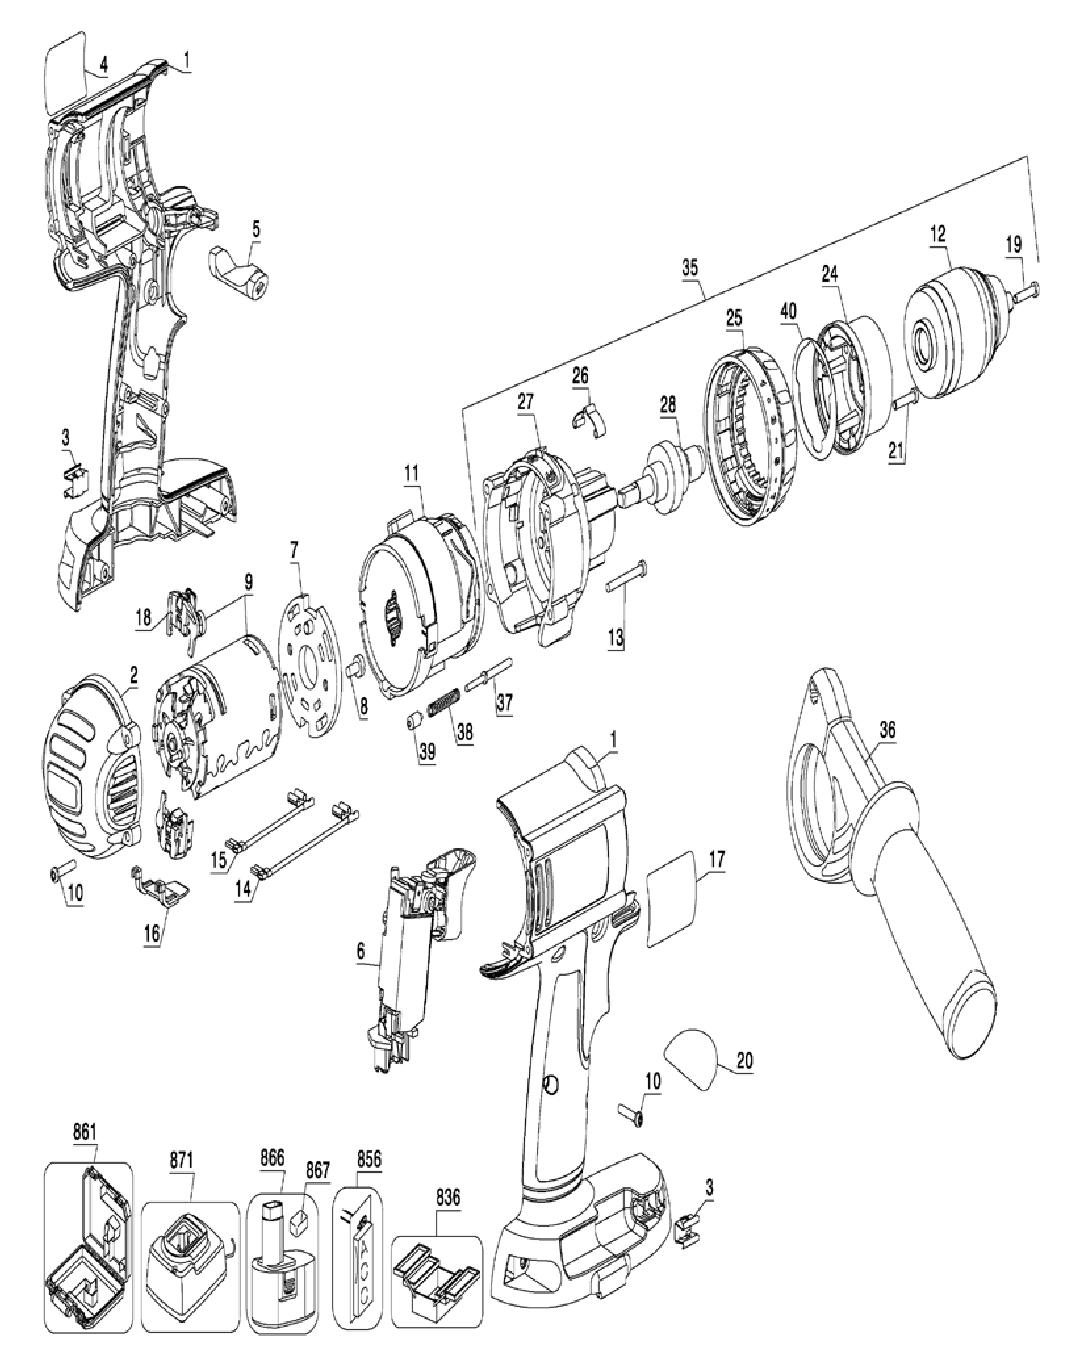 Dw705 Wiring Diagram | Wiring Liry on